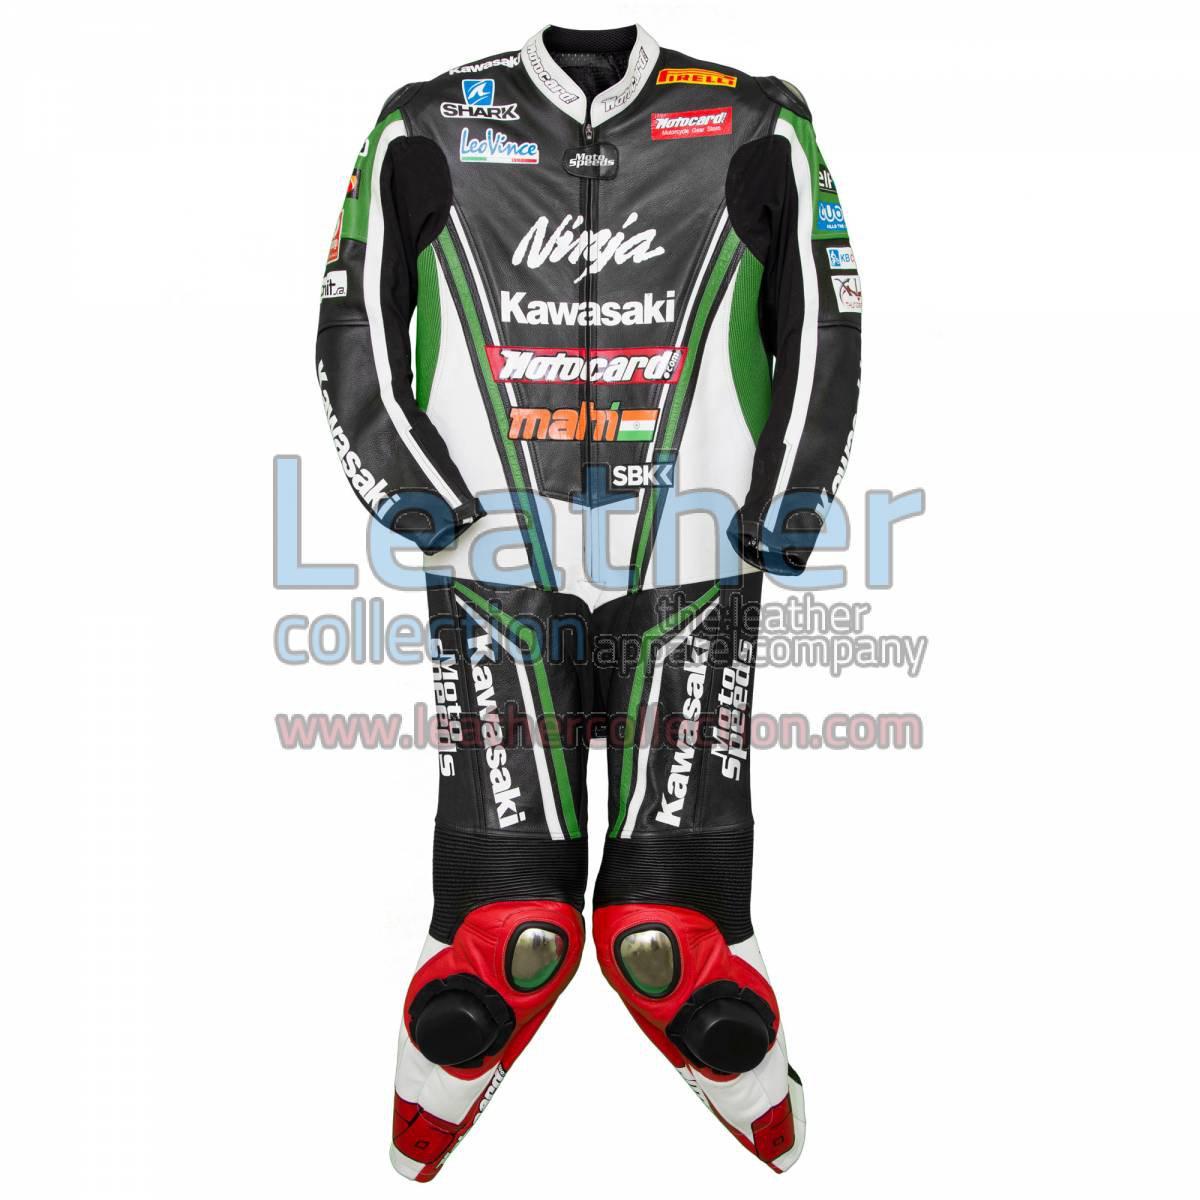 Kawasaki Ninja Tom Sykes 2013 Champion Leathers